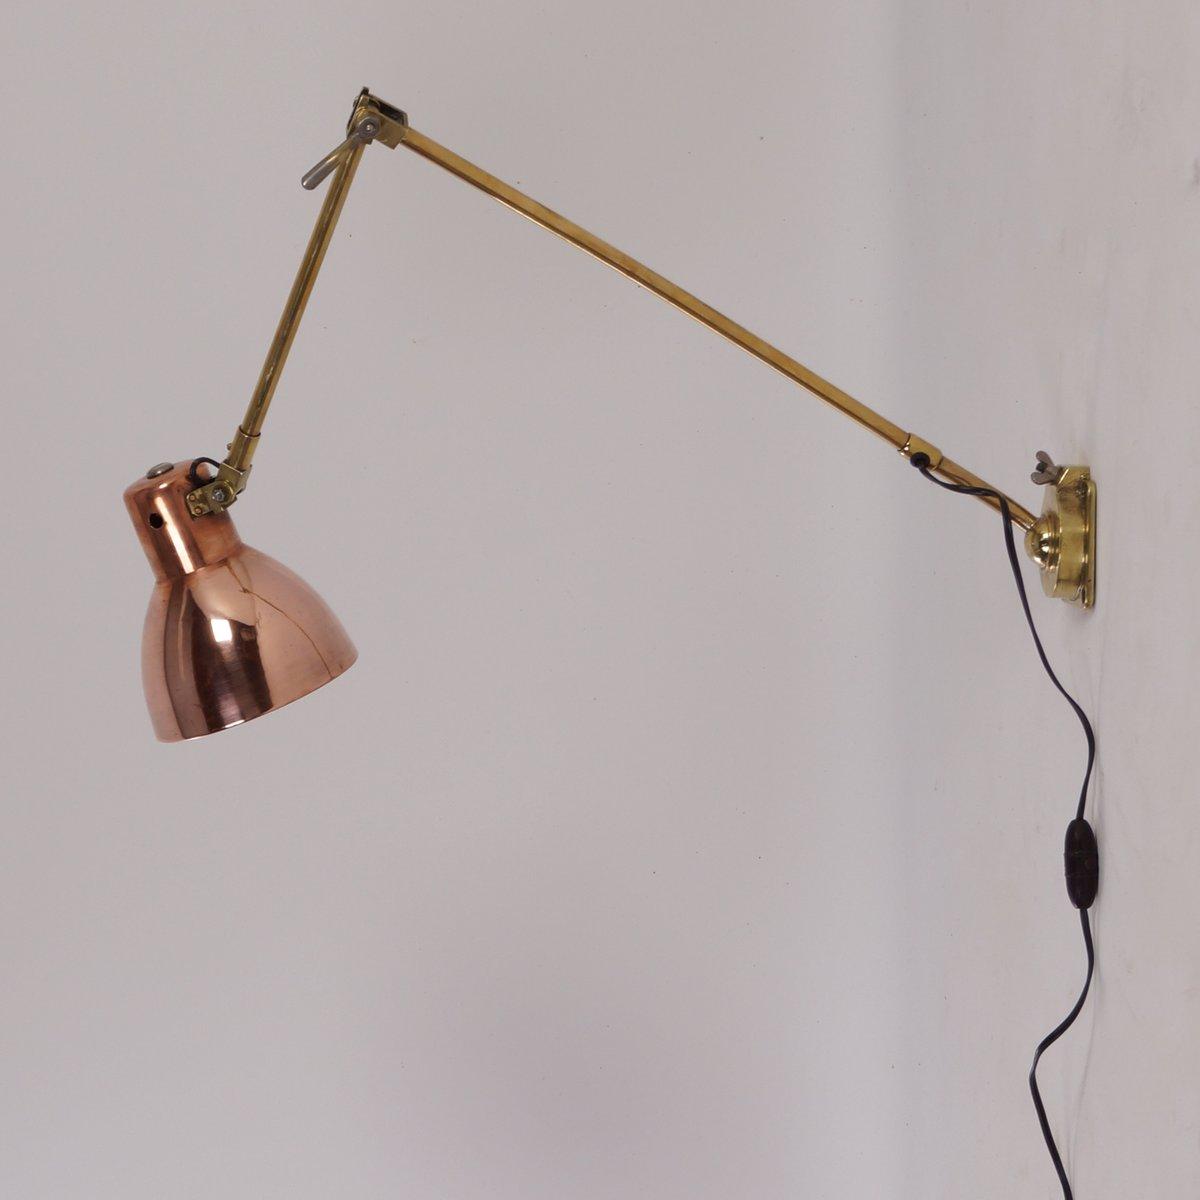 bauhaus kupfer messing wandlampe von kandem 1930er bei pamono kaufen. Black Bedroom Furniture Sets. Home Design Ideas